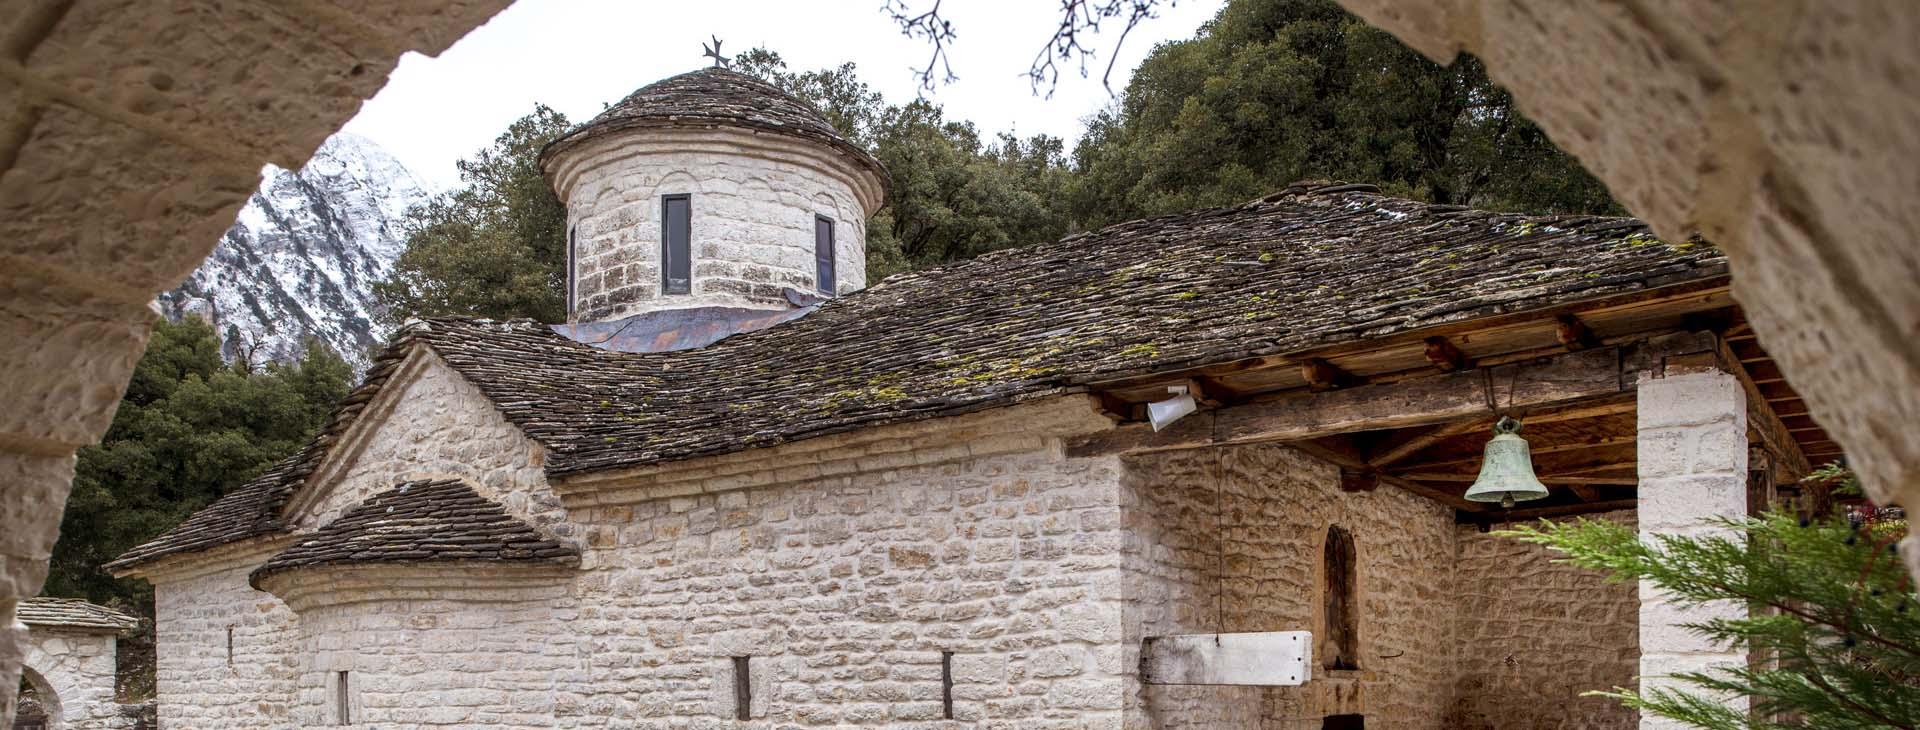 Monastery of Zoodochos Pigi of Anthohori, Metsovo, Ioannina